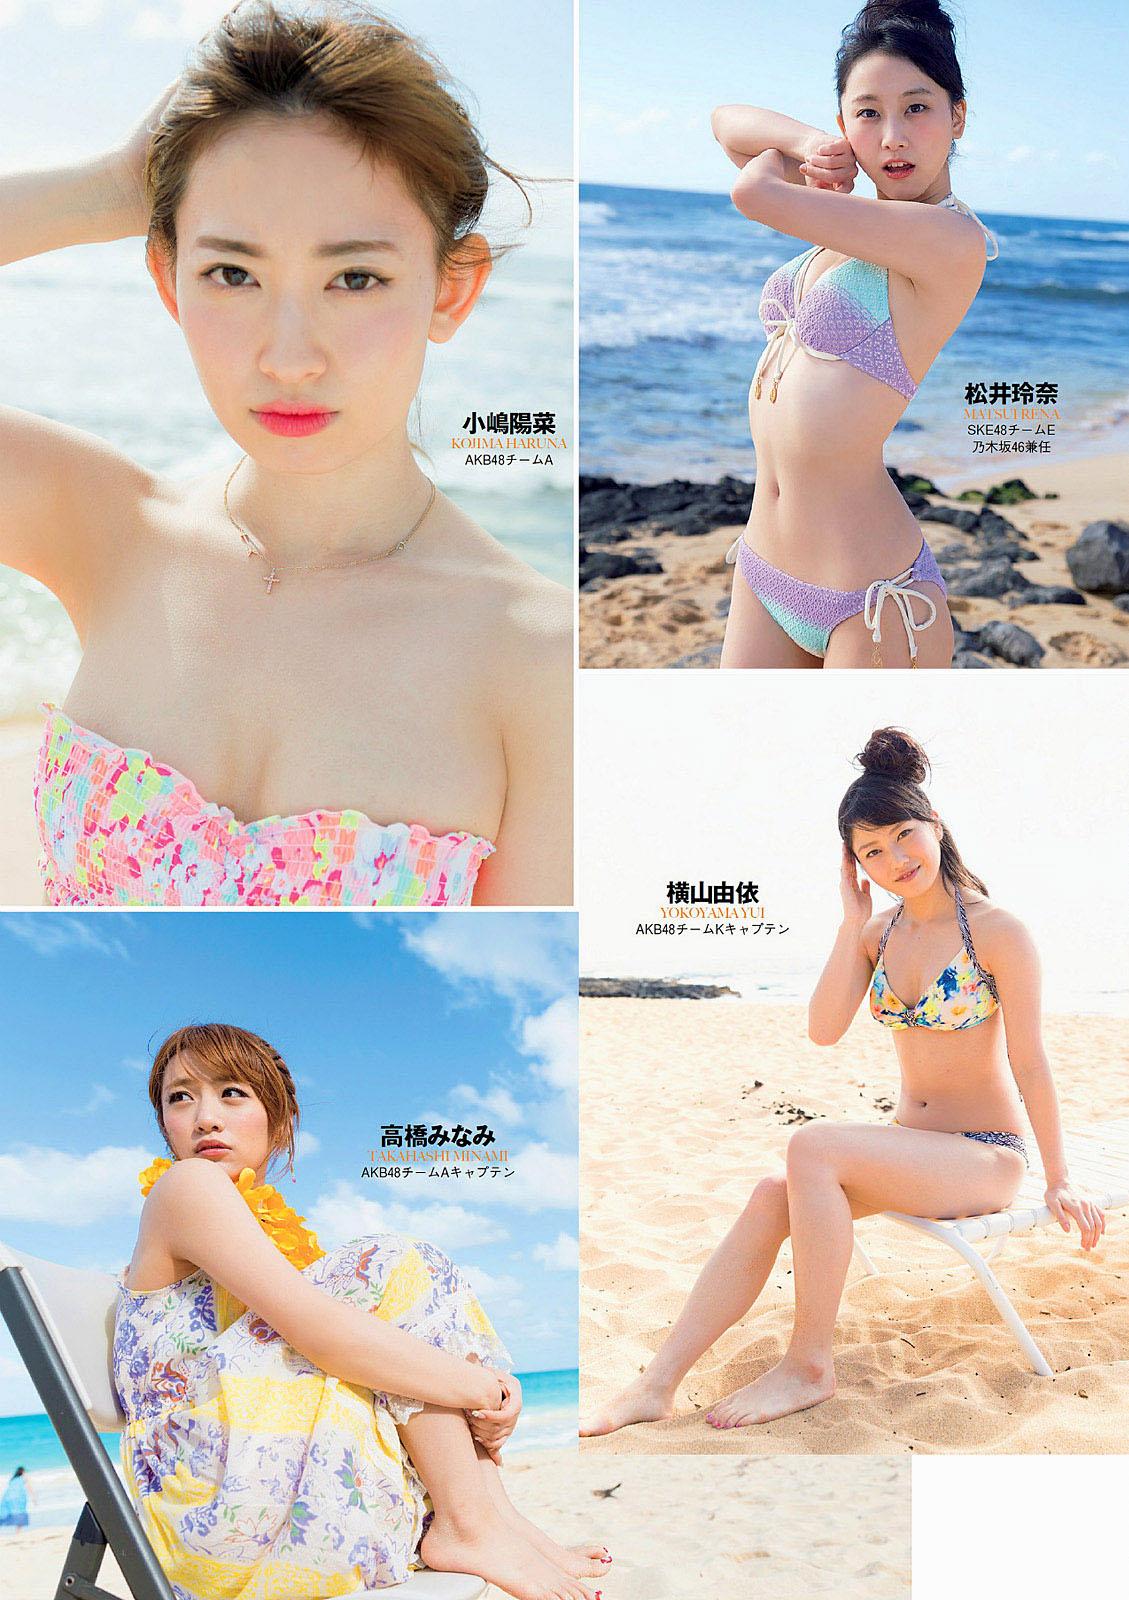 AKB48 WPB 140414 03.jpg